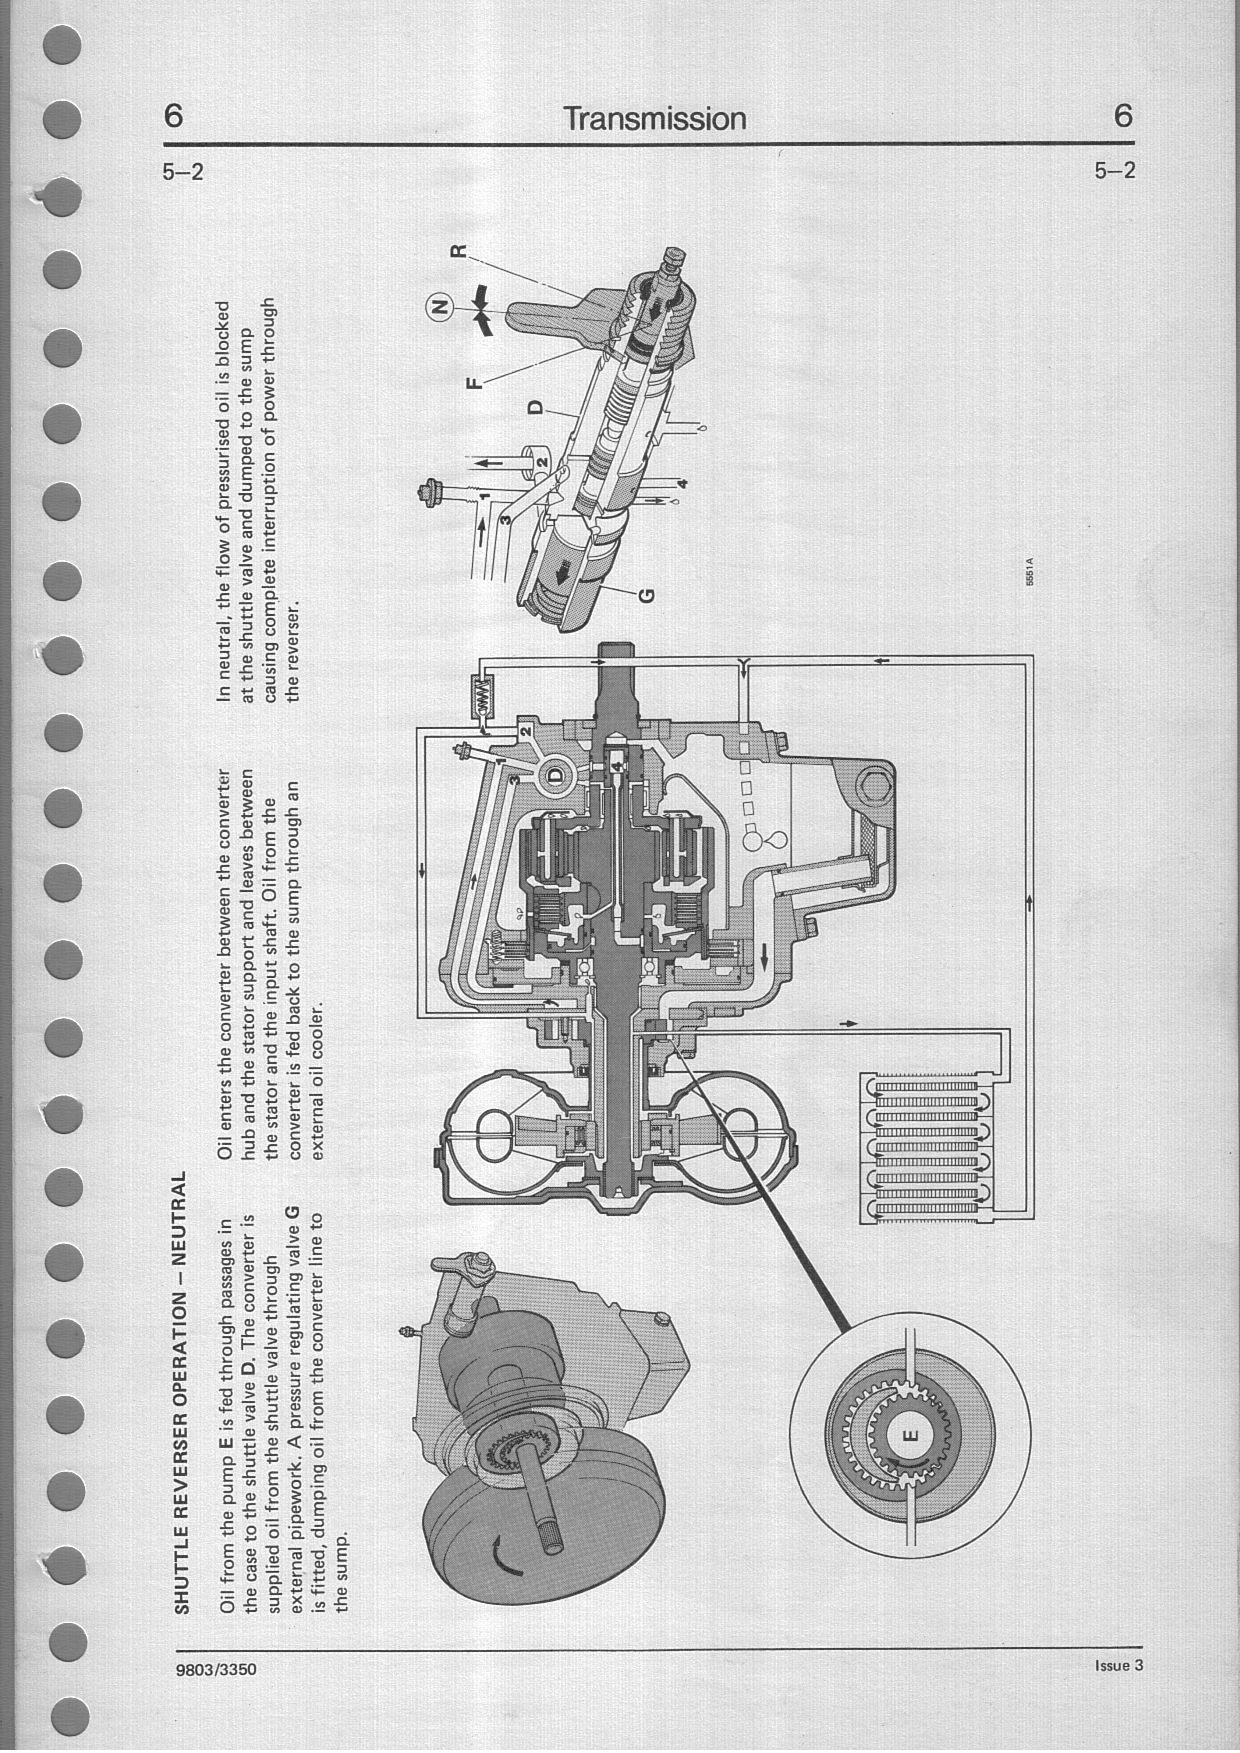 2011-07-08_112010_jcb_shuttle_trans_pg2 Jcb Cx Wiring Diagram on jcb transmission diagram, jcb skid steer diagrams, jcb parts diagram, jcb tractor, jcb 525 50 wirng diagram, jcb backhoe wiring schematics, cummins engine diagram, jcb battery diagram, hyster forklift diagram,